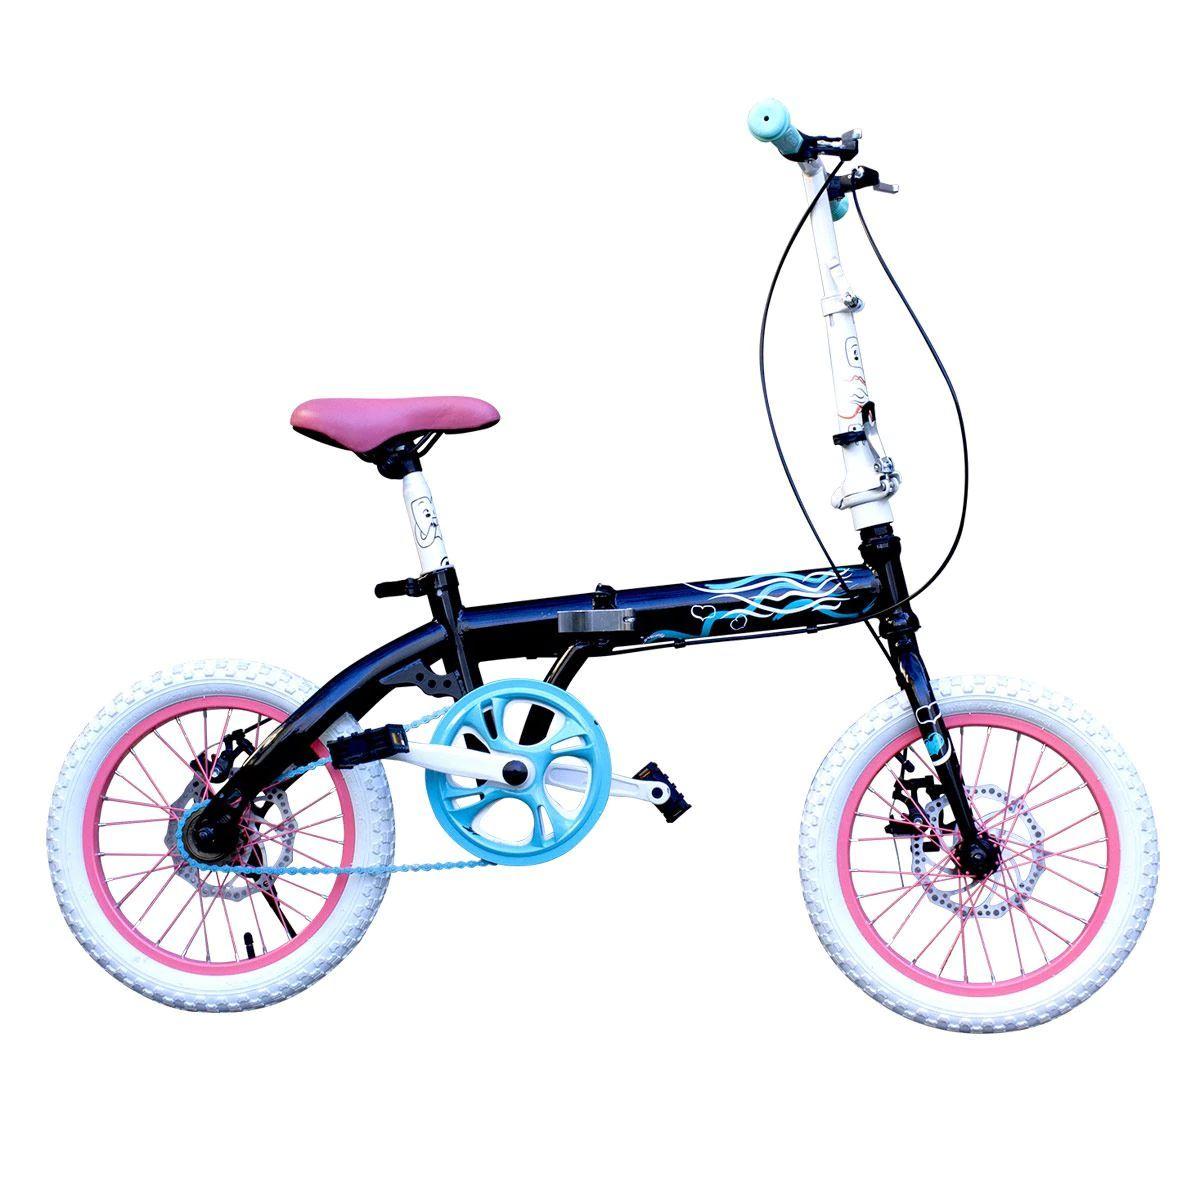 Sanborns: Bia Bicicleta plegable Pat Avenue (SANBORNS EN LINEA)